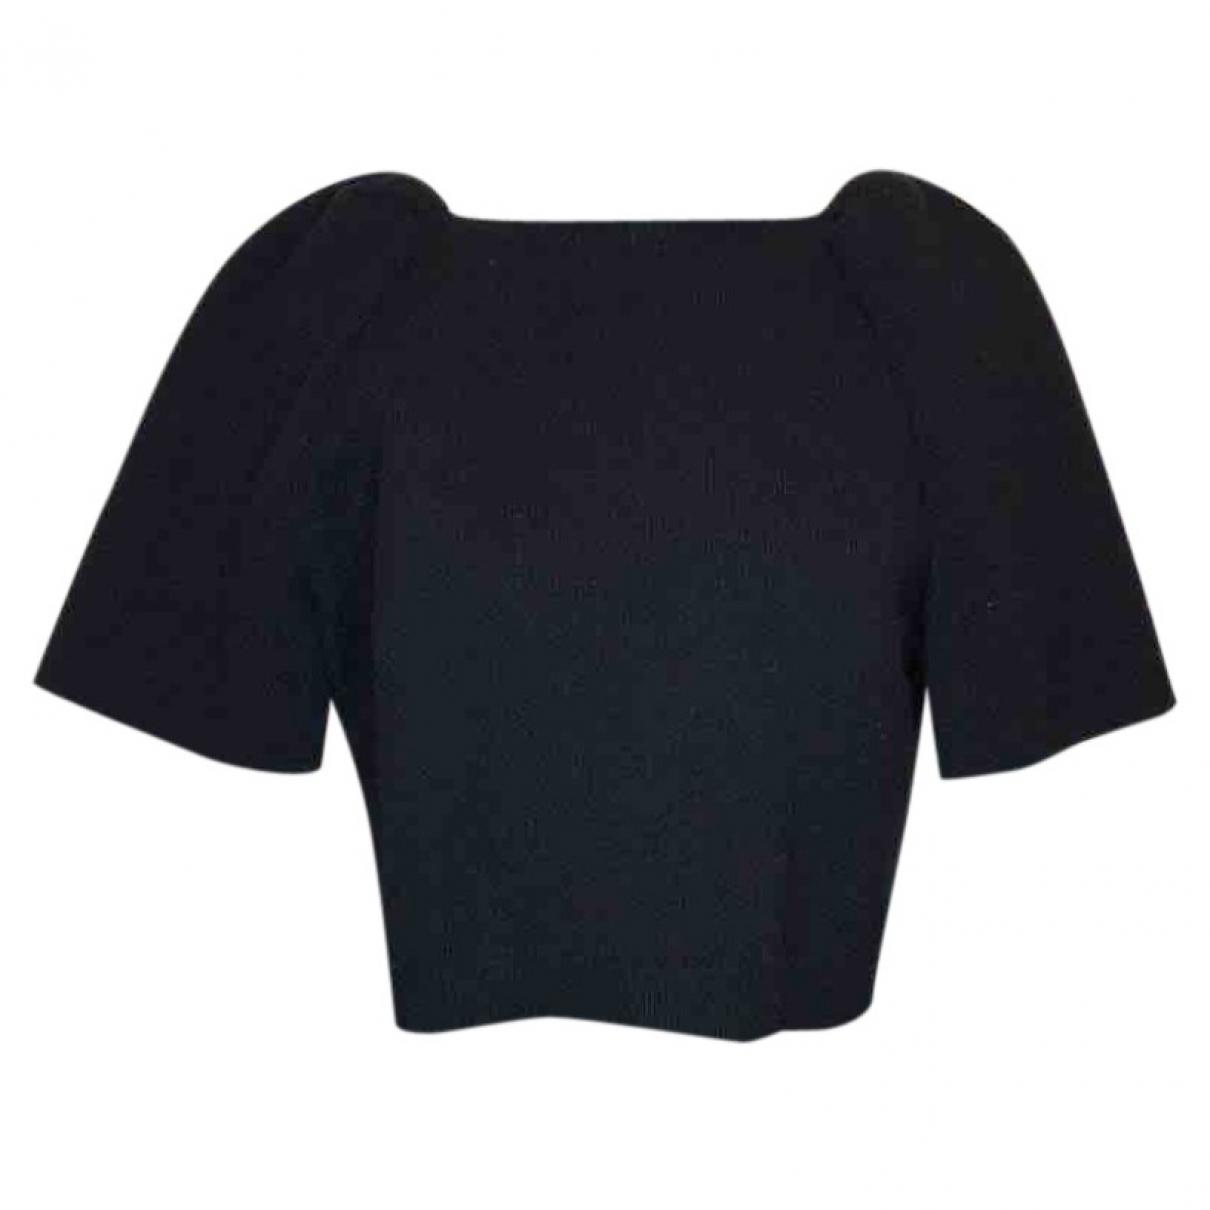 Giambattista Valli \N Black Wool  top for Women S International